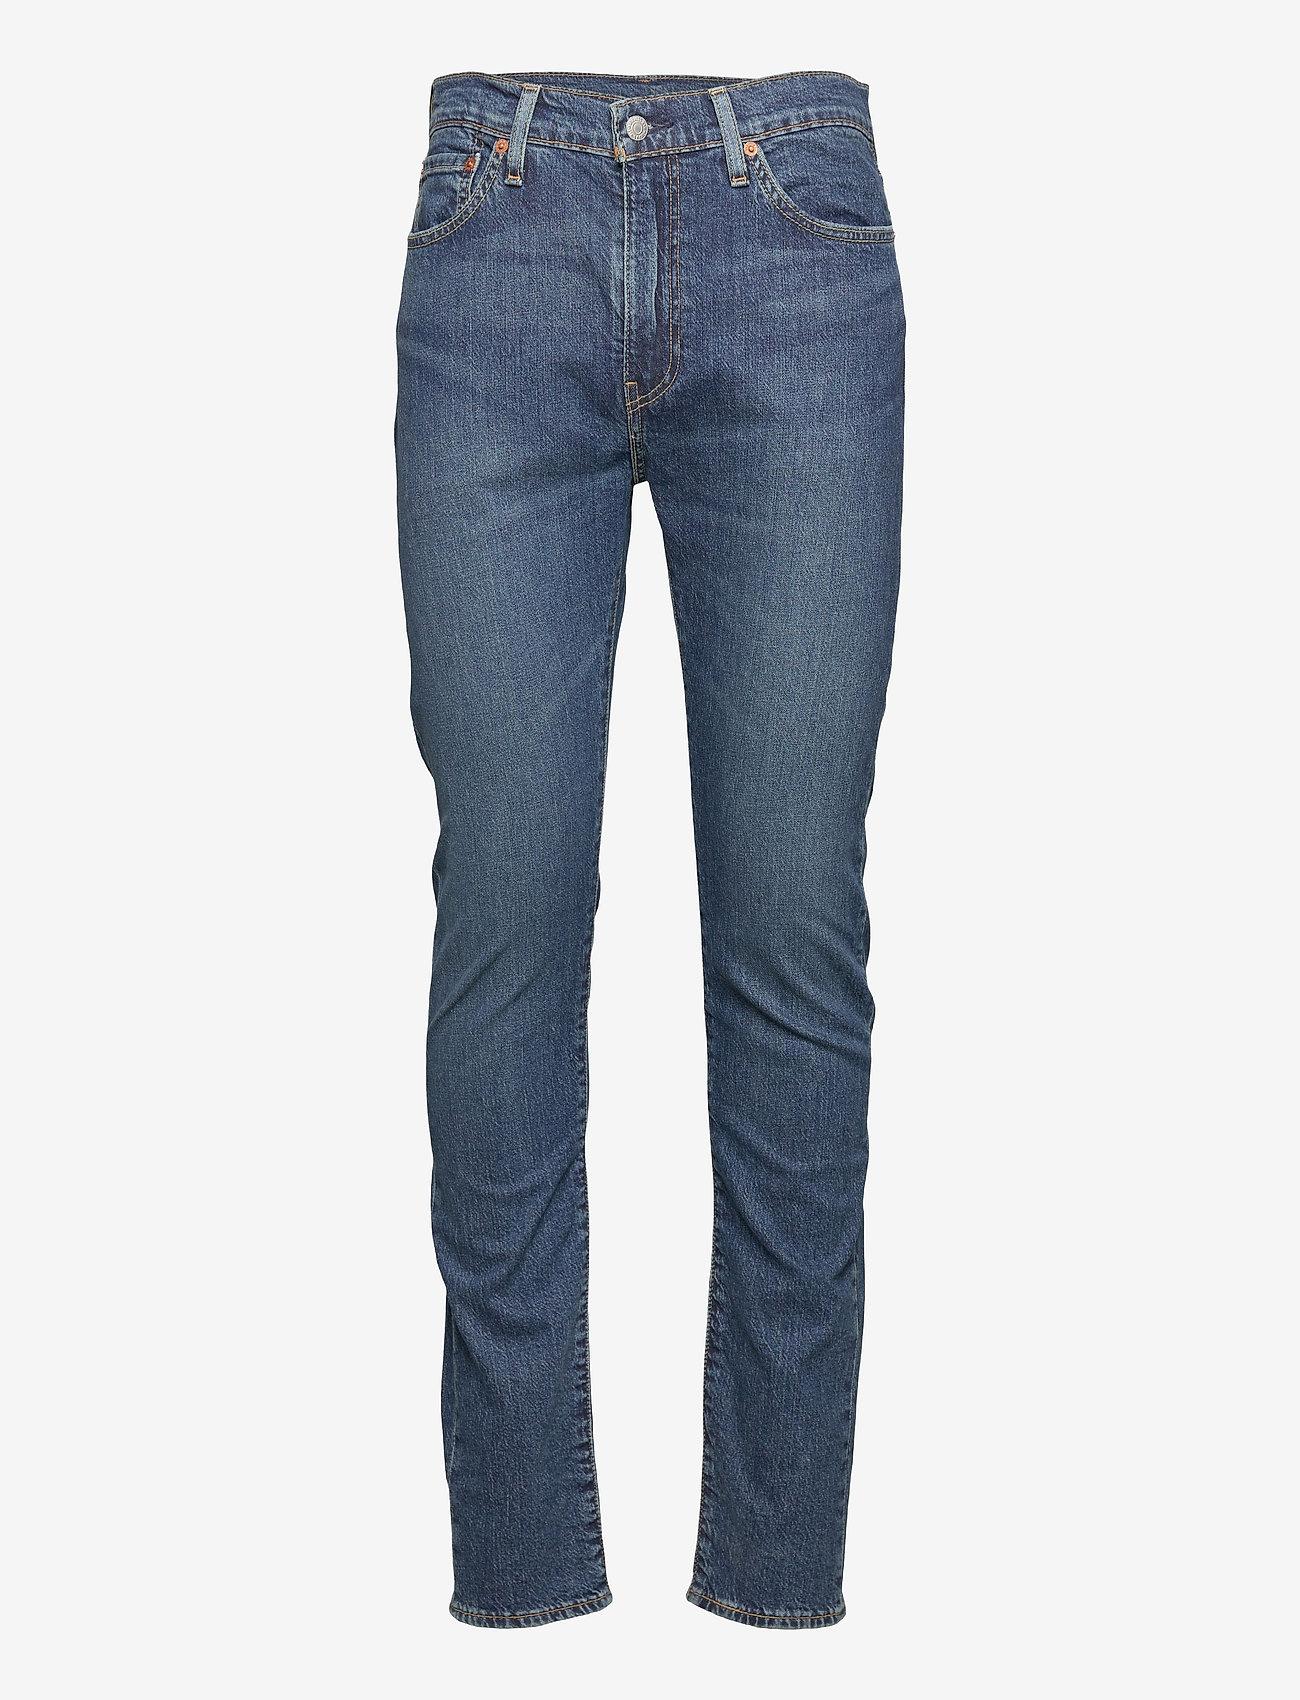 LEVI´S Men - 512 SLIM TAPER WHOOP - slim jeans - dark indigo - flat finish - 0